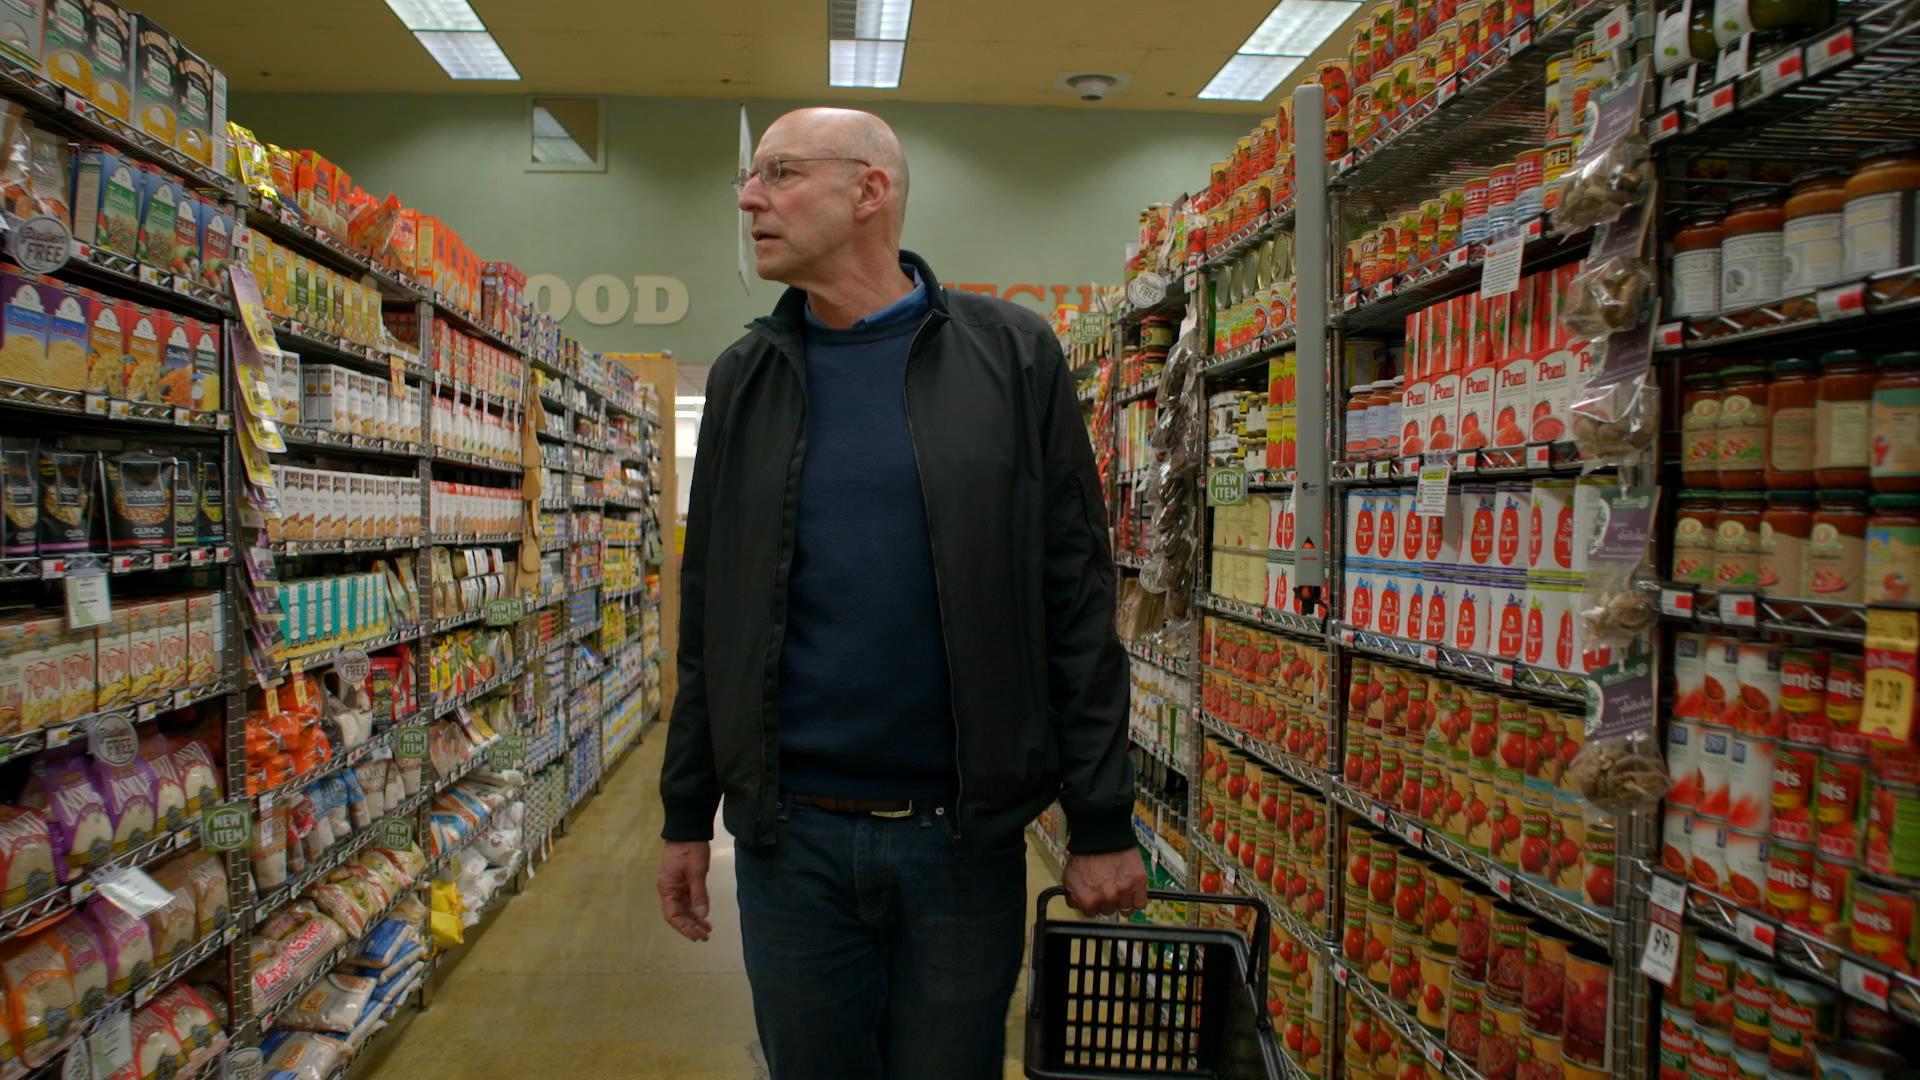 Michael Pollan in the film In Defense of Food.